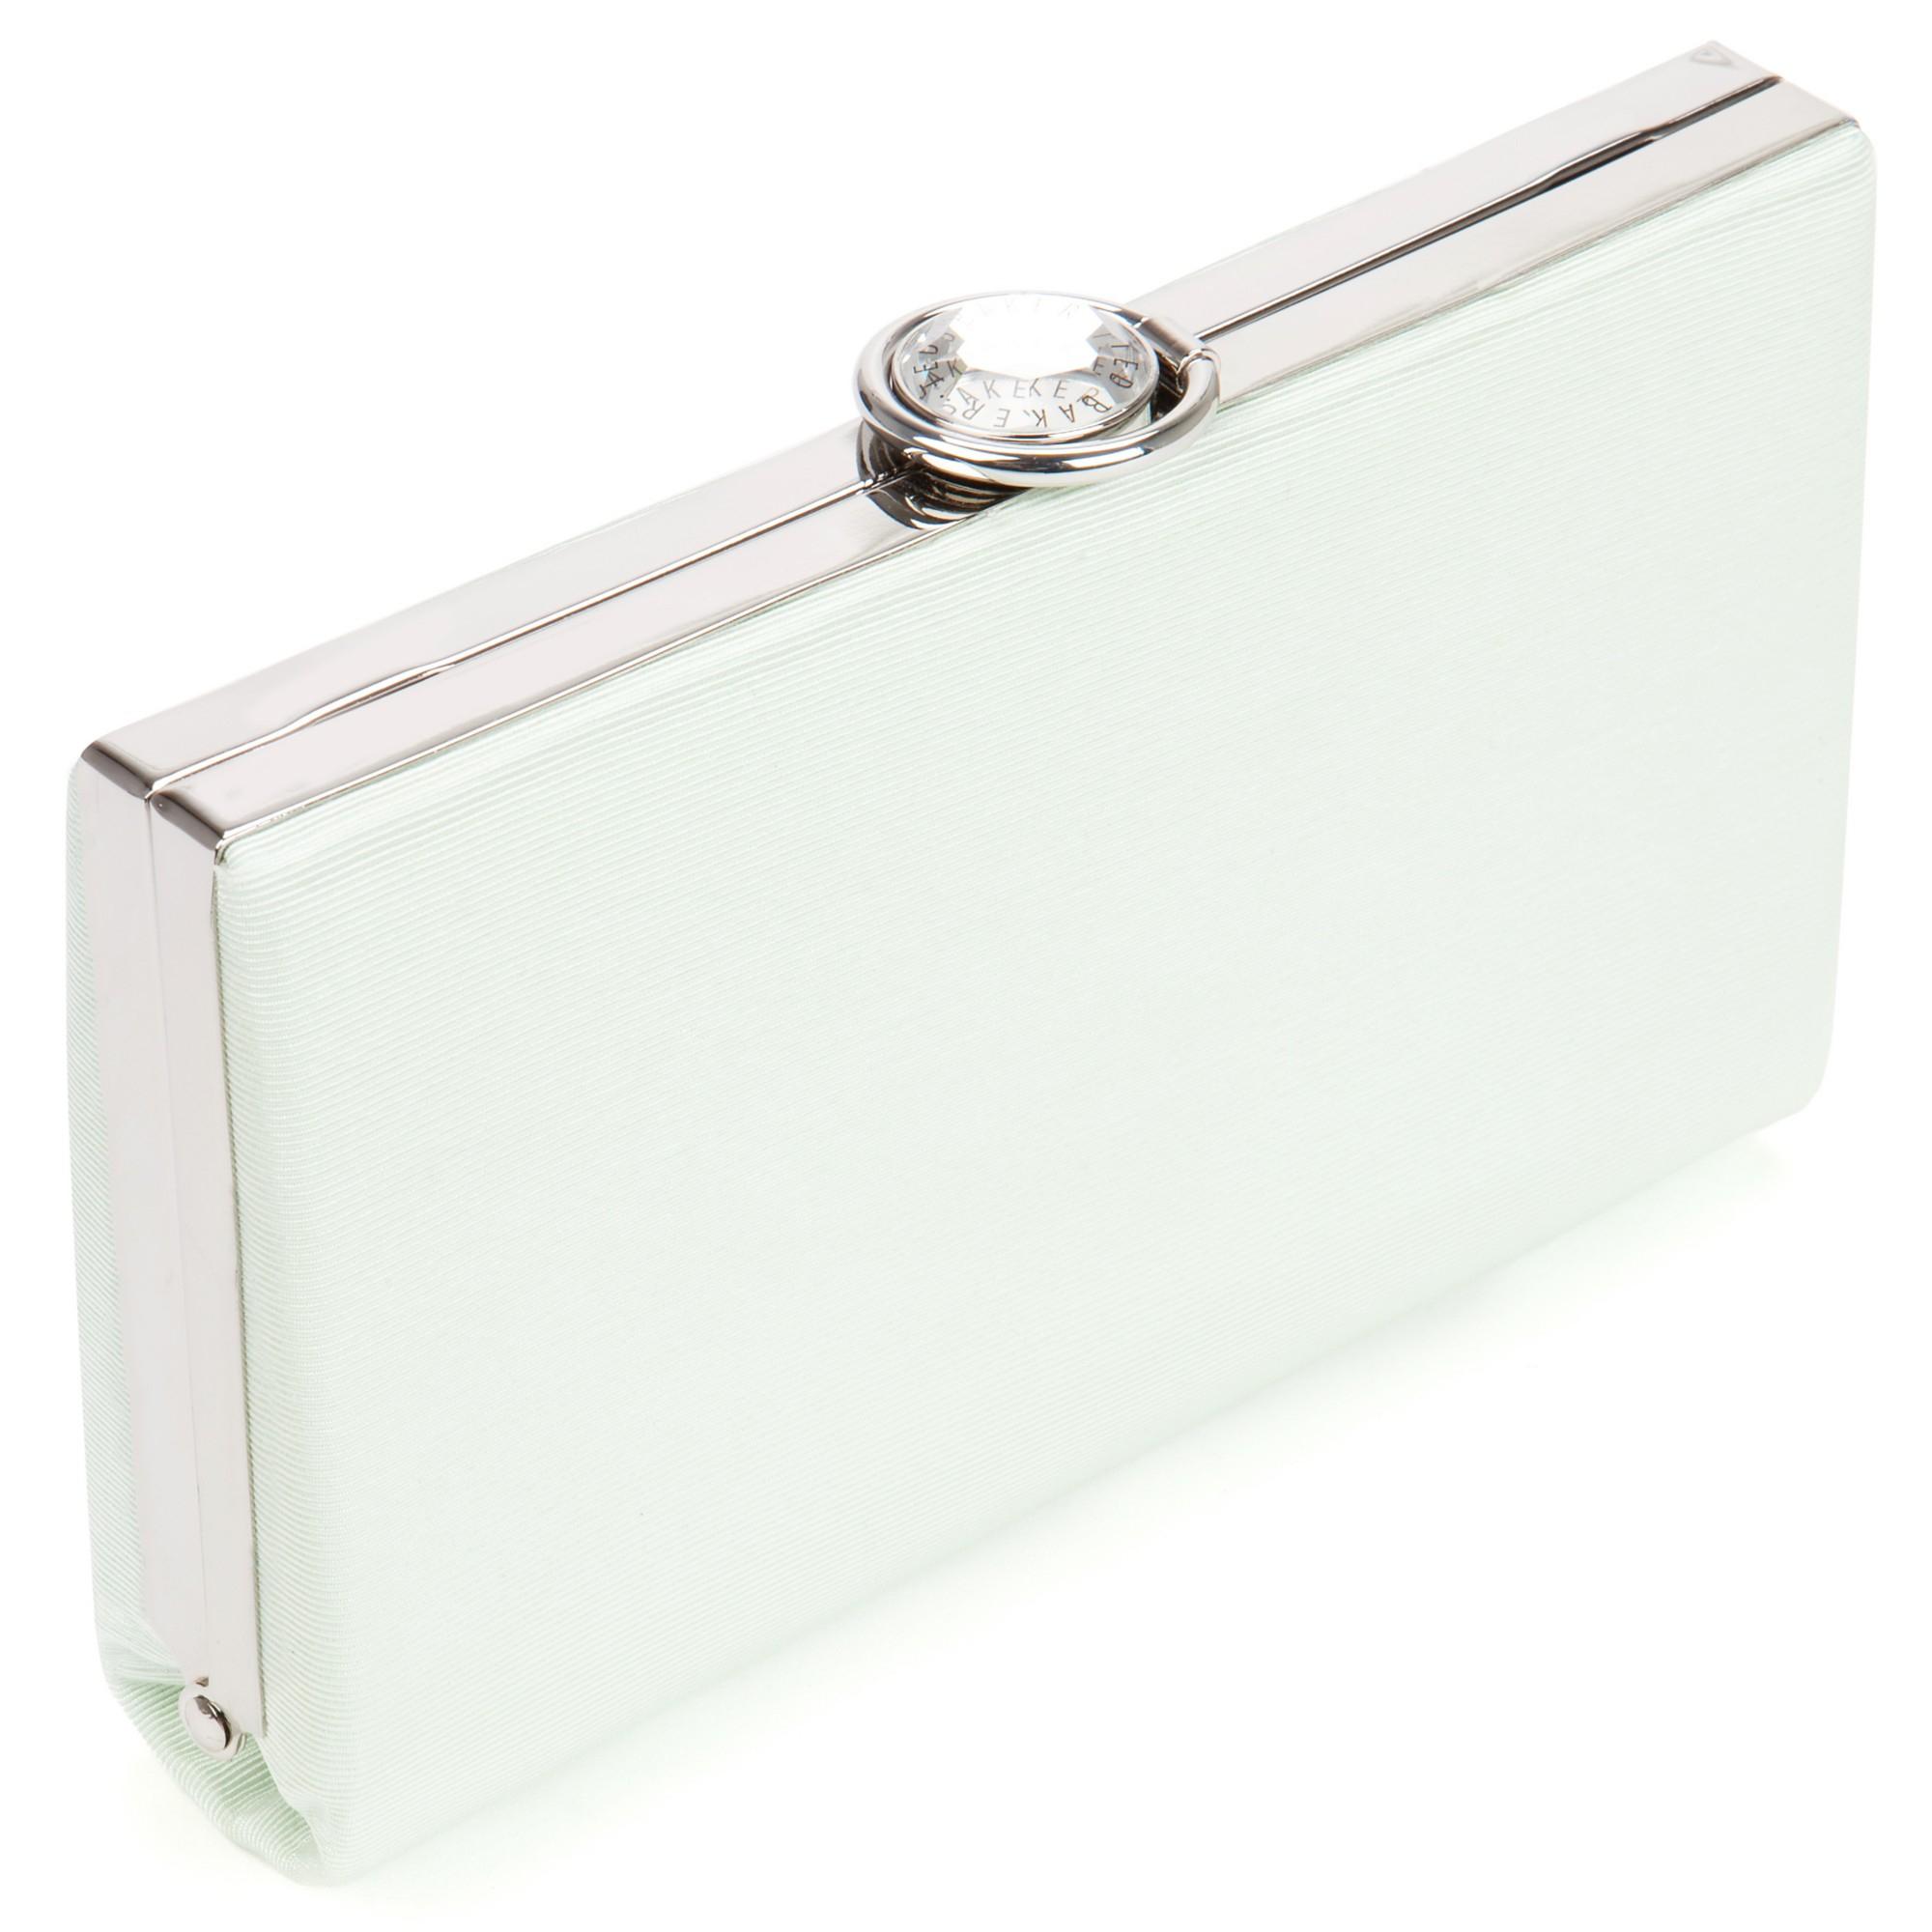 6573cbeaf699 Ted Baker Alivia Hardcase Clutch Bag in Green - Lyst